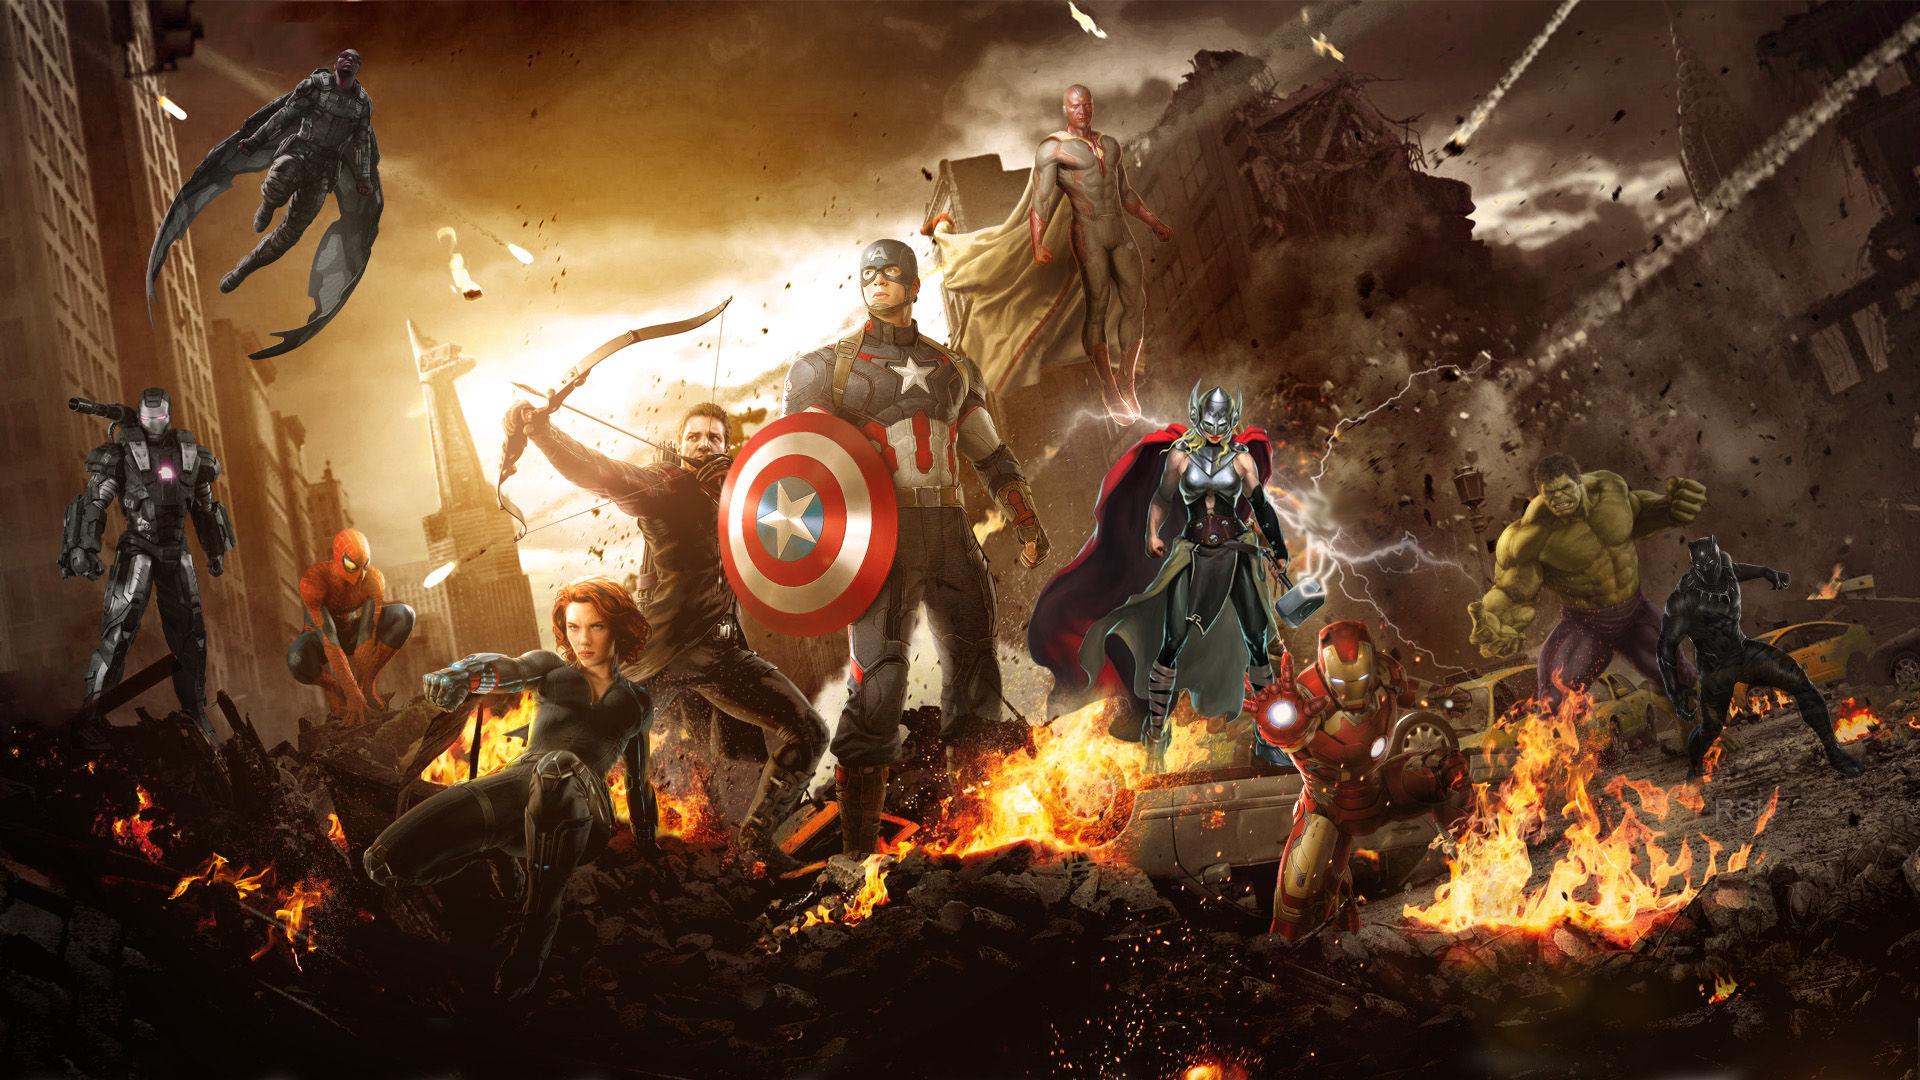 Spider man is in captain america civil war already - Avengers civil war wallpaper ...